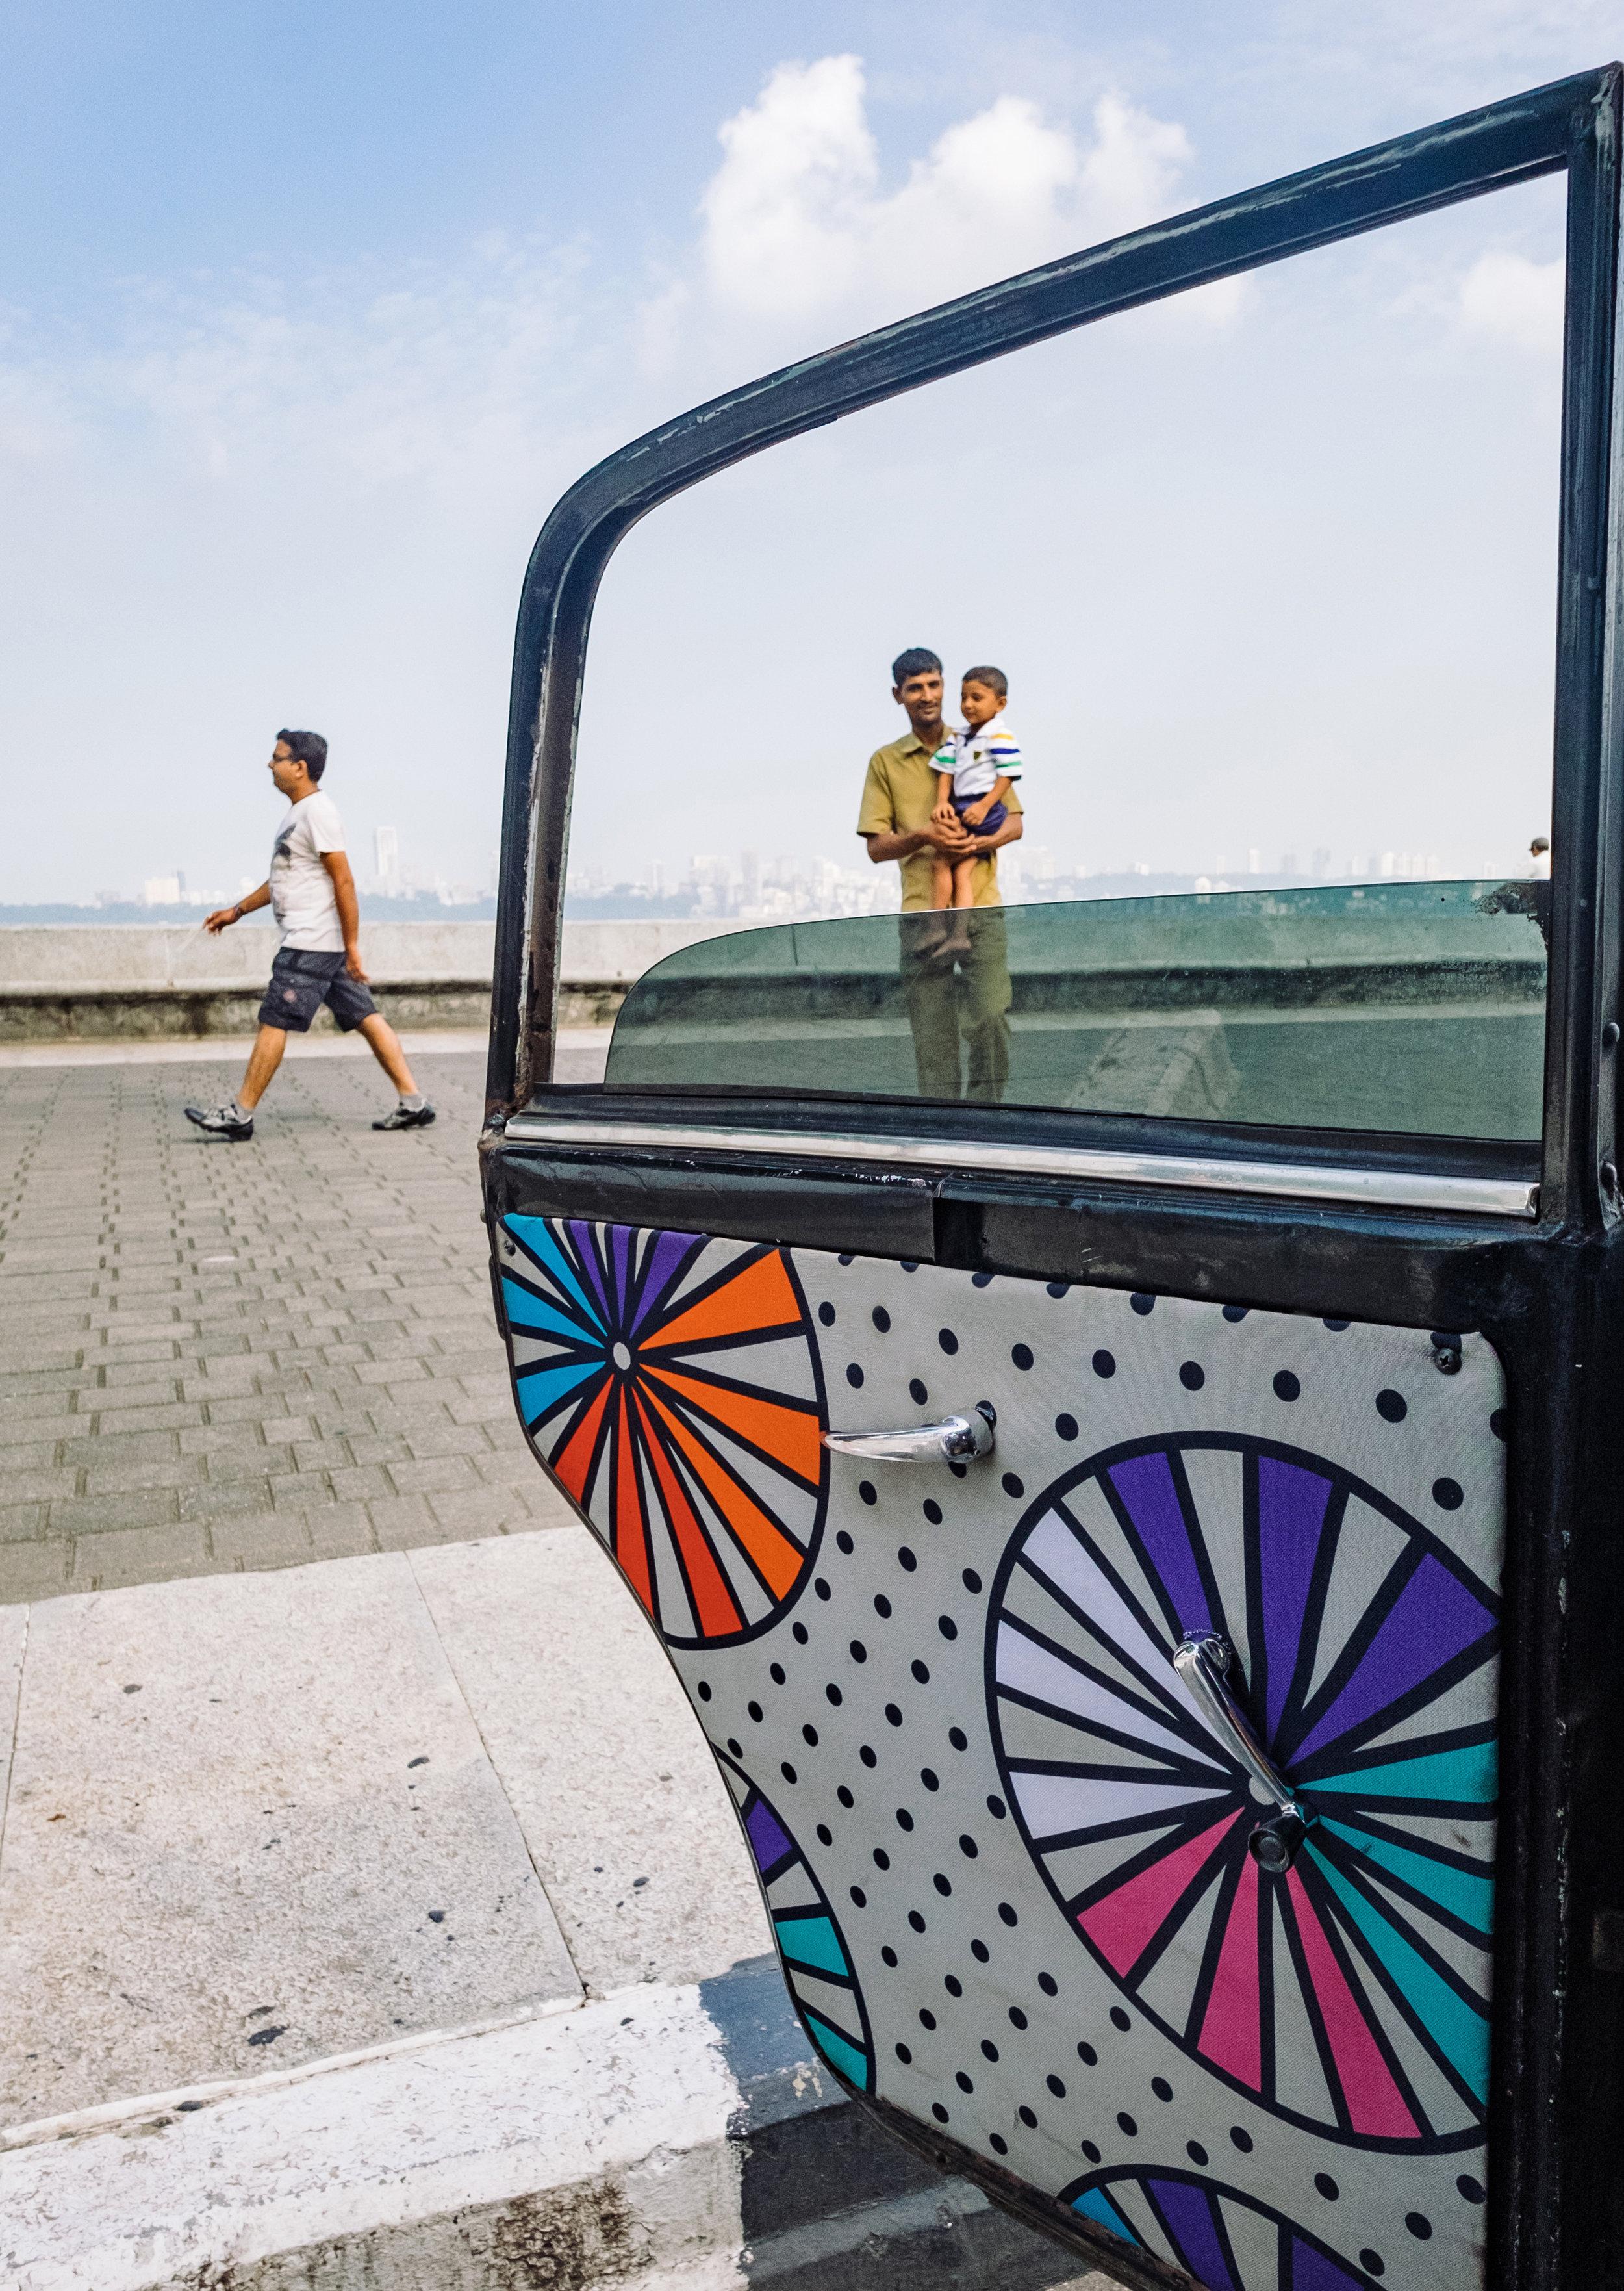 Firki by Shweta Malhotra for Taxi Fabric project (image by Aashim Tyagi)